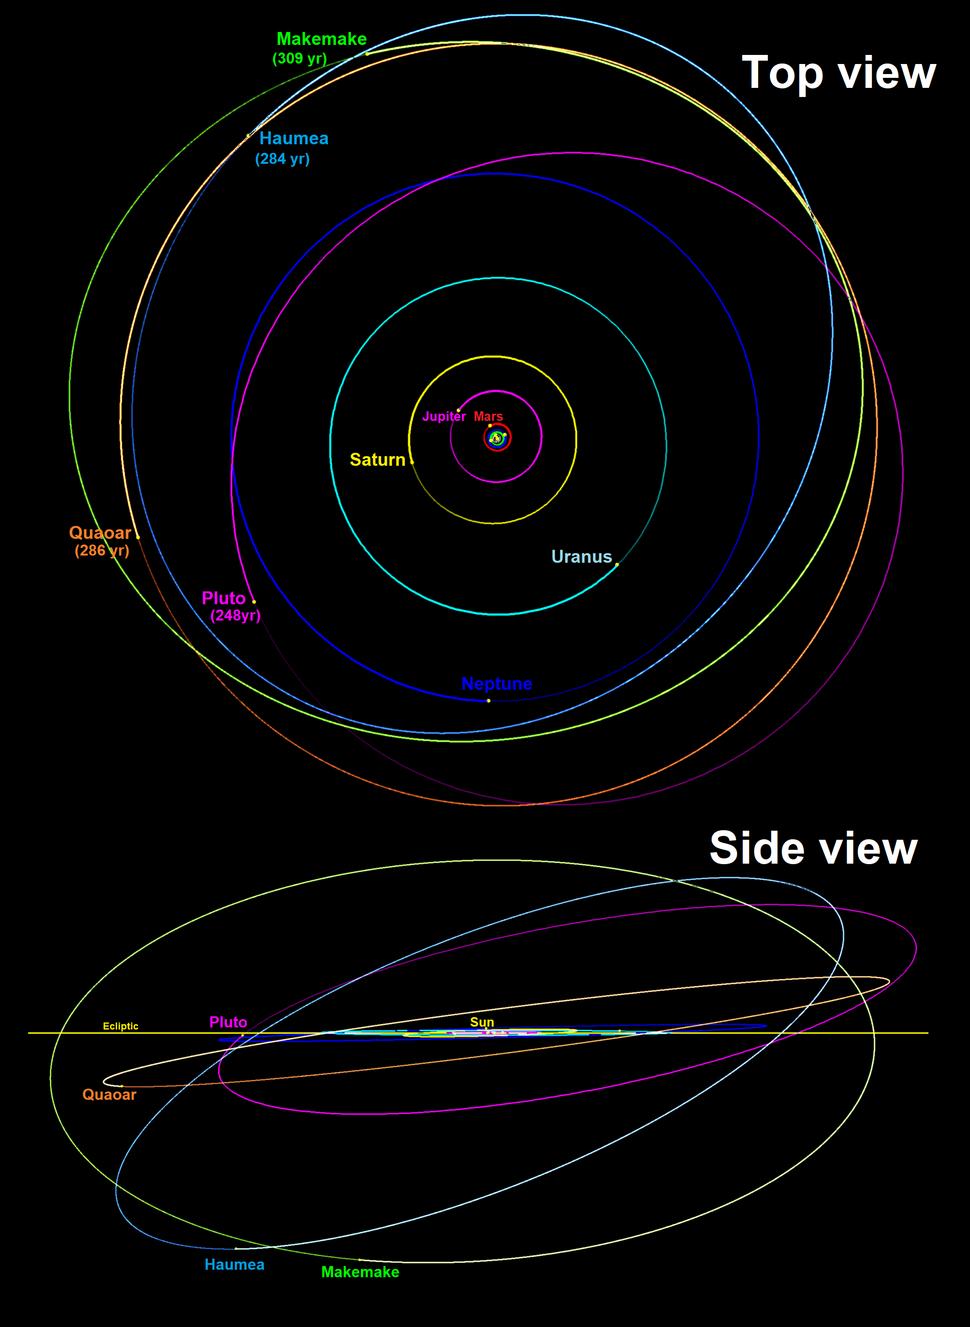 Quaoar's orbit with Makemake and Haumea